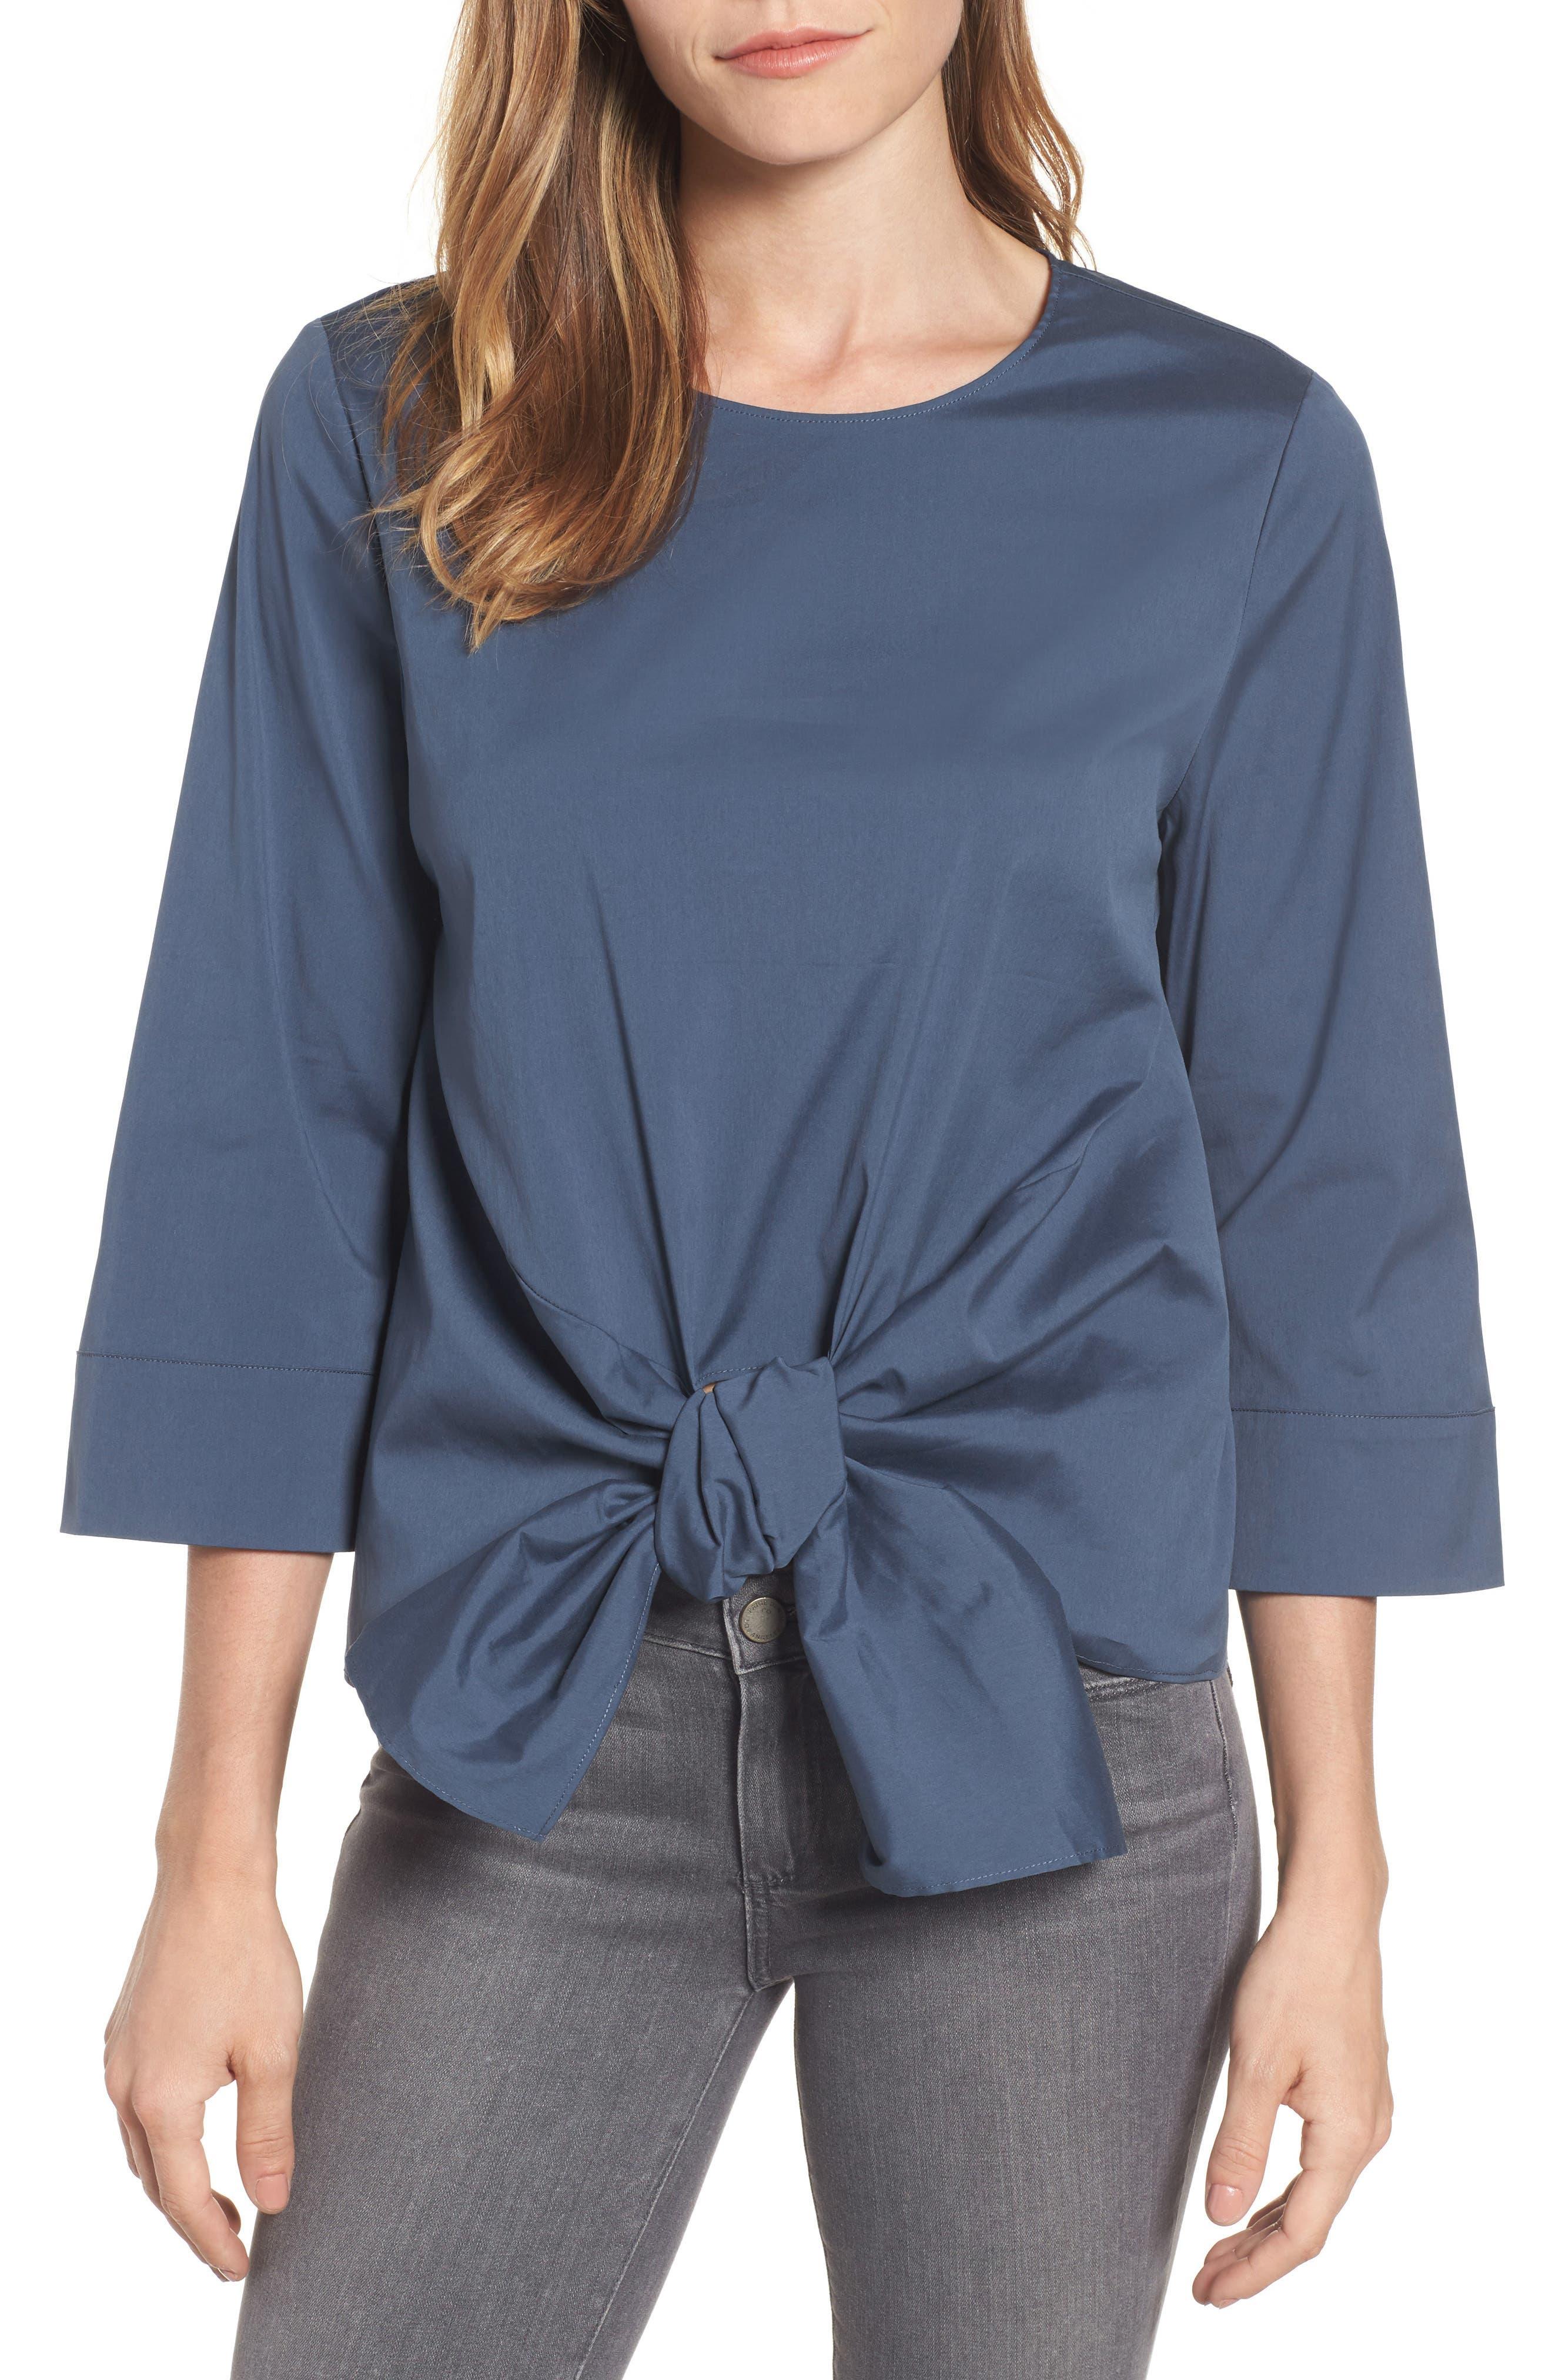 Alternate Image 1 Selected - Halogen® Tie Front Blouse (Regular & Petite)